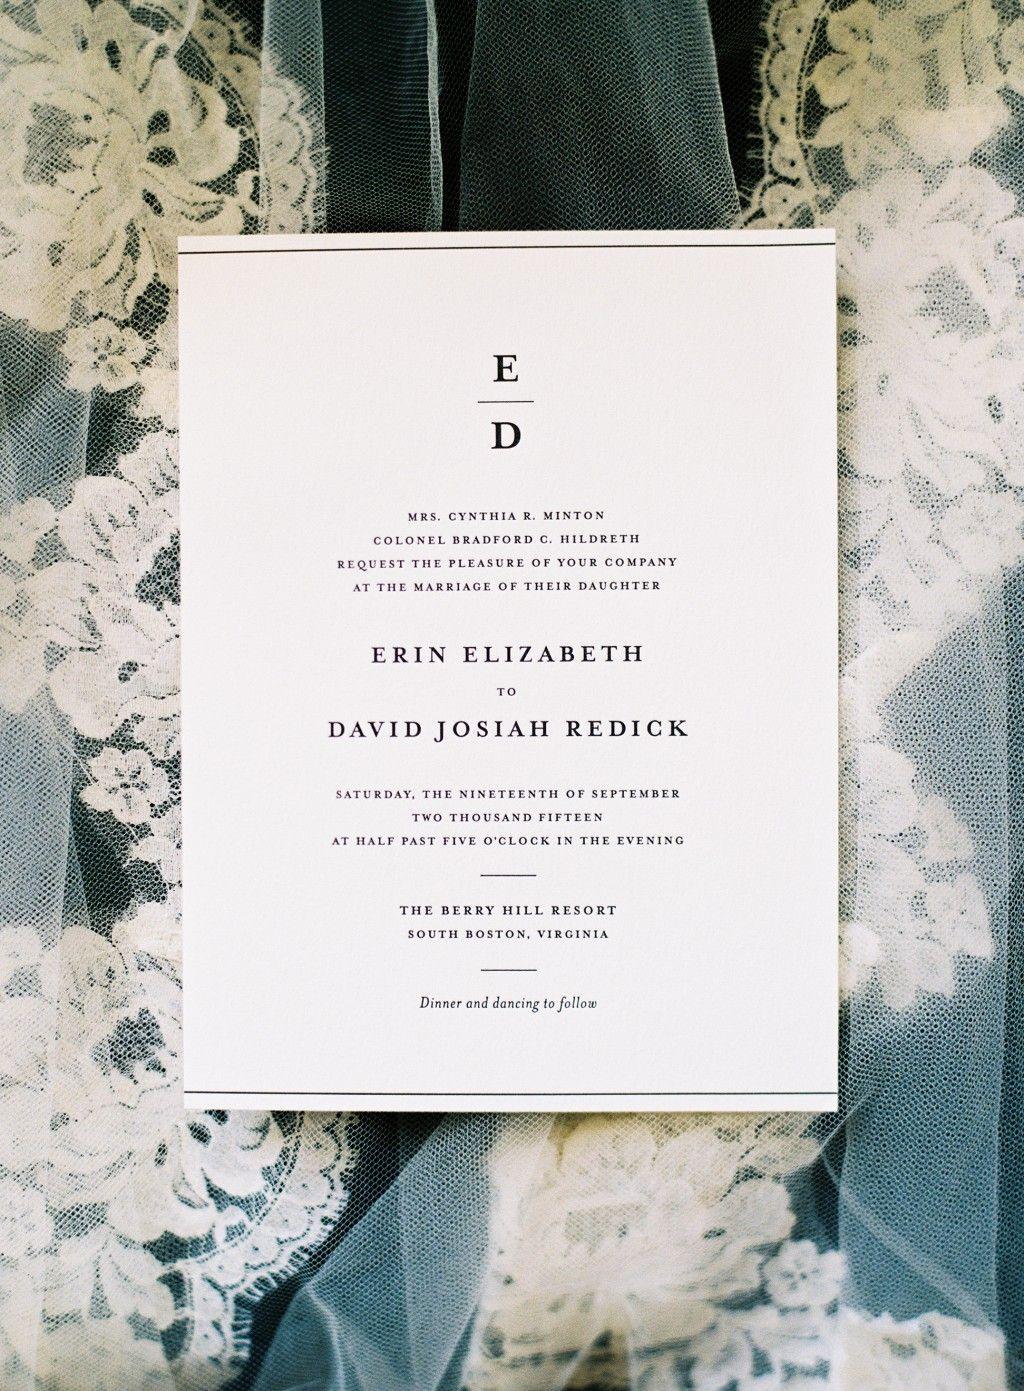 Simple Elegance letterpress wedding invitations from Bella